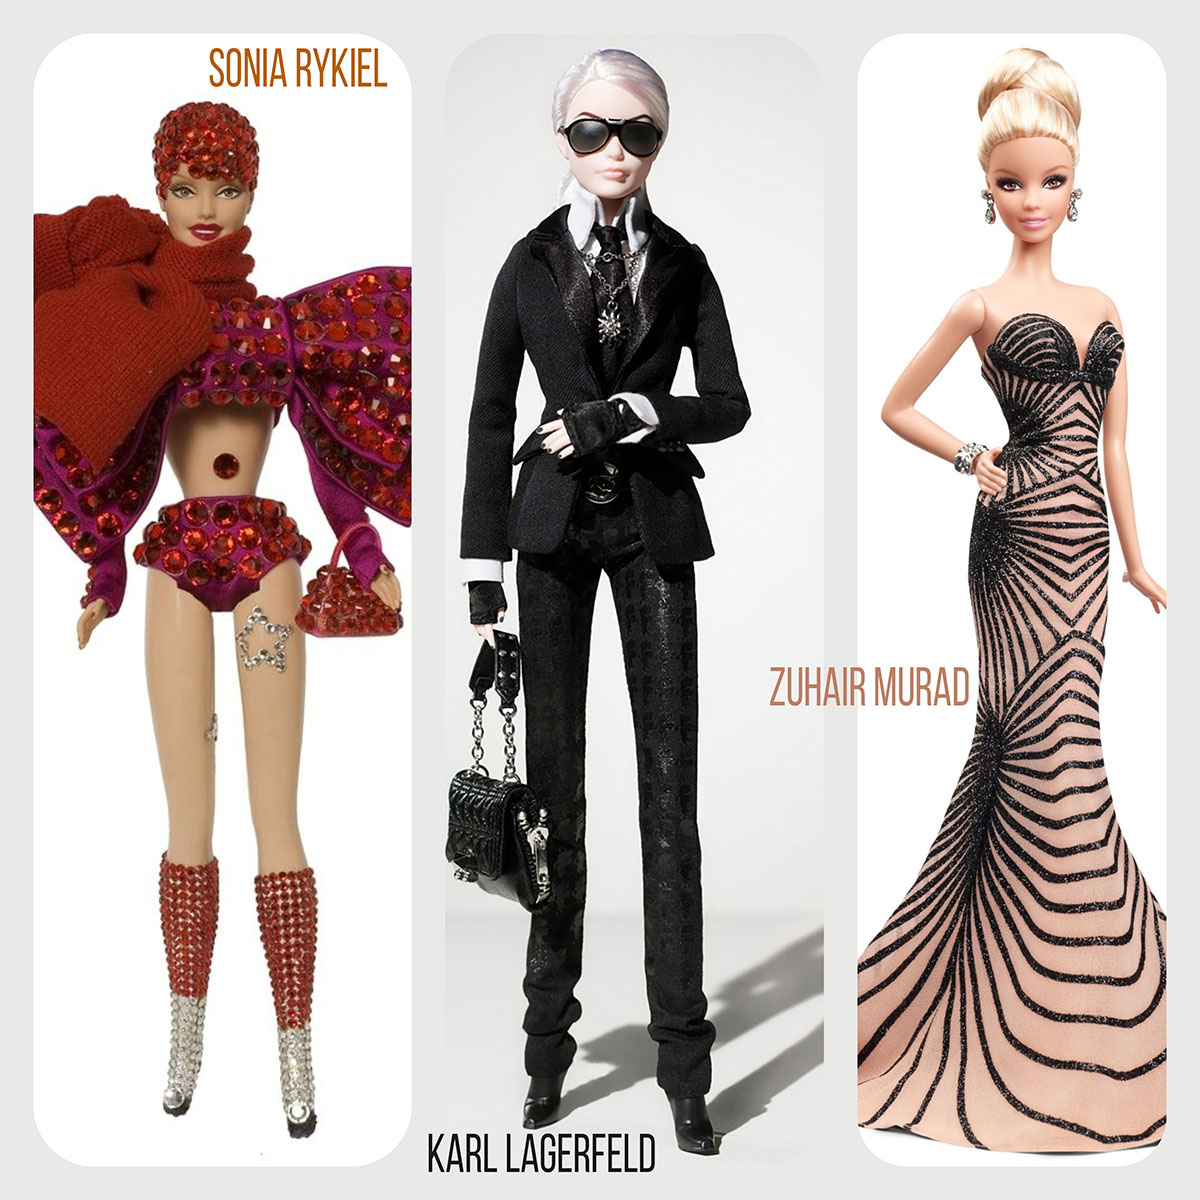 Barbie-Runway-Magazine-sonia-rykiel-Karl-Lagerfeld-Zuhair-Murad